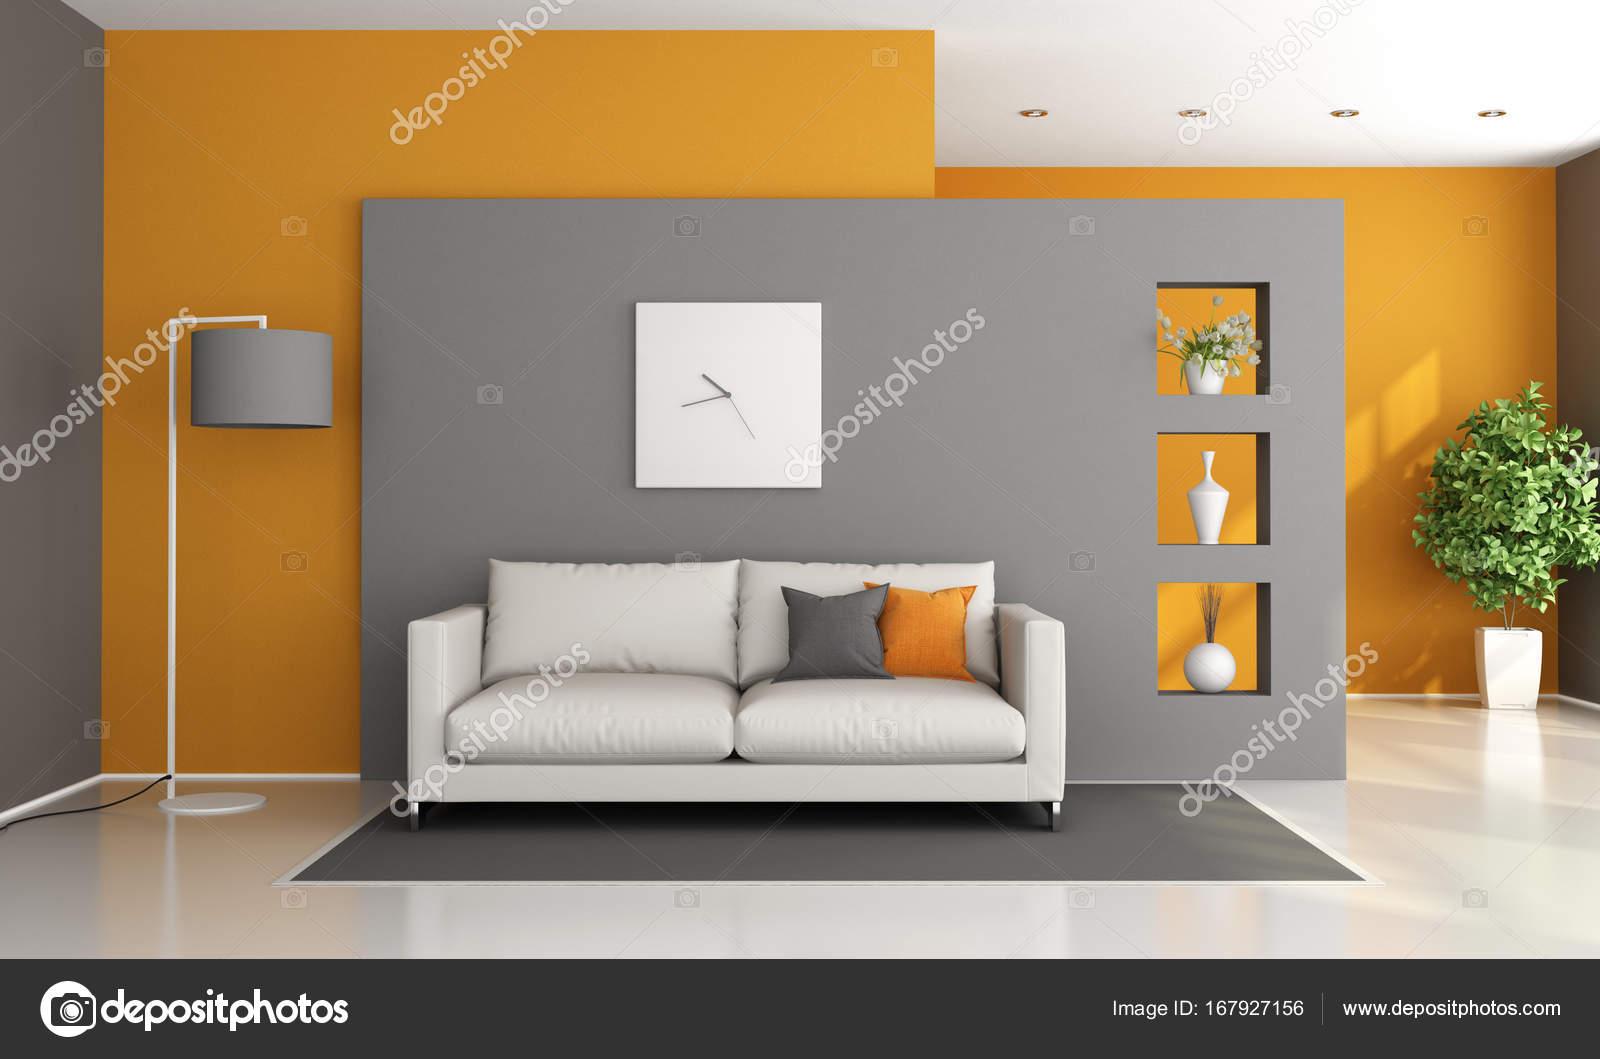 Moderno saln gris y naranja  Fotos de Stock